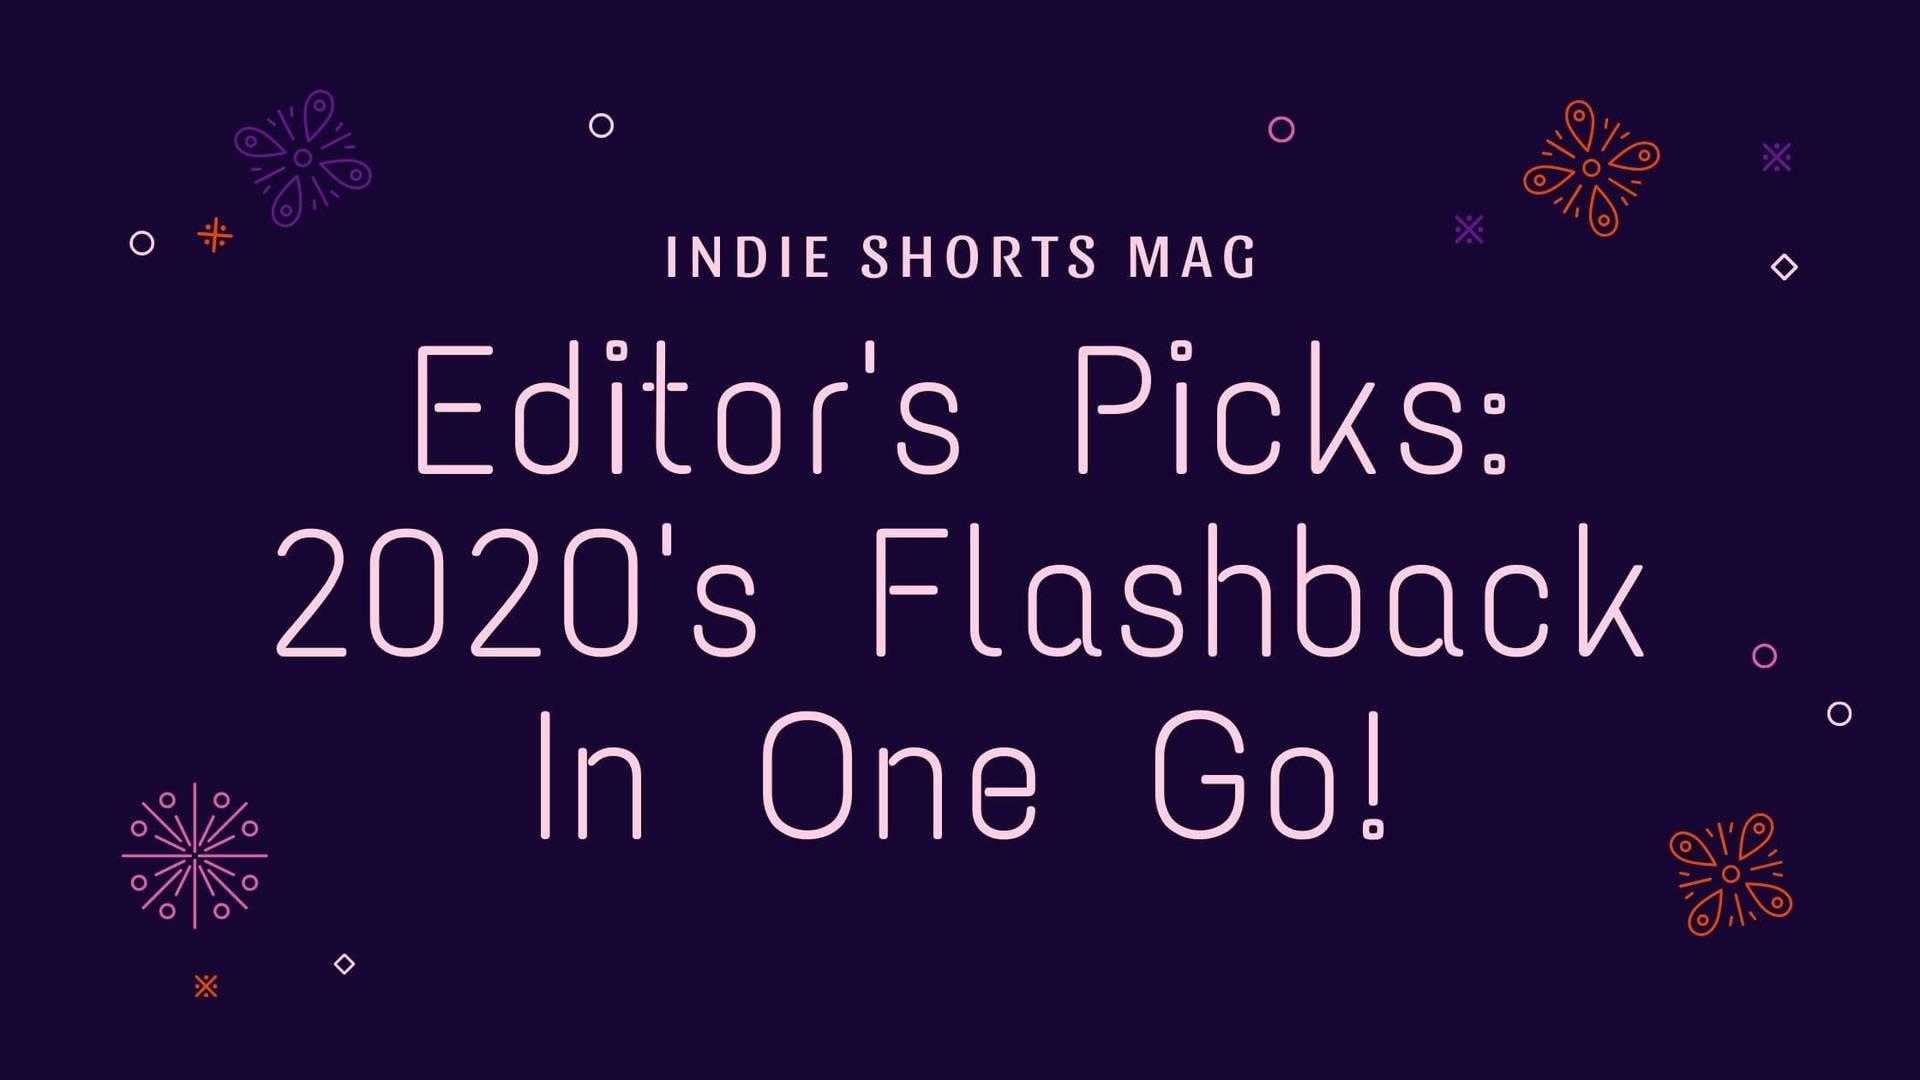 Editor's Picks: 2020's Flashback In One Go!